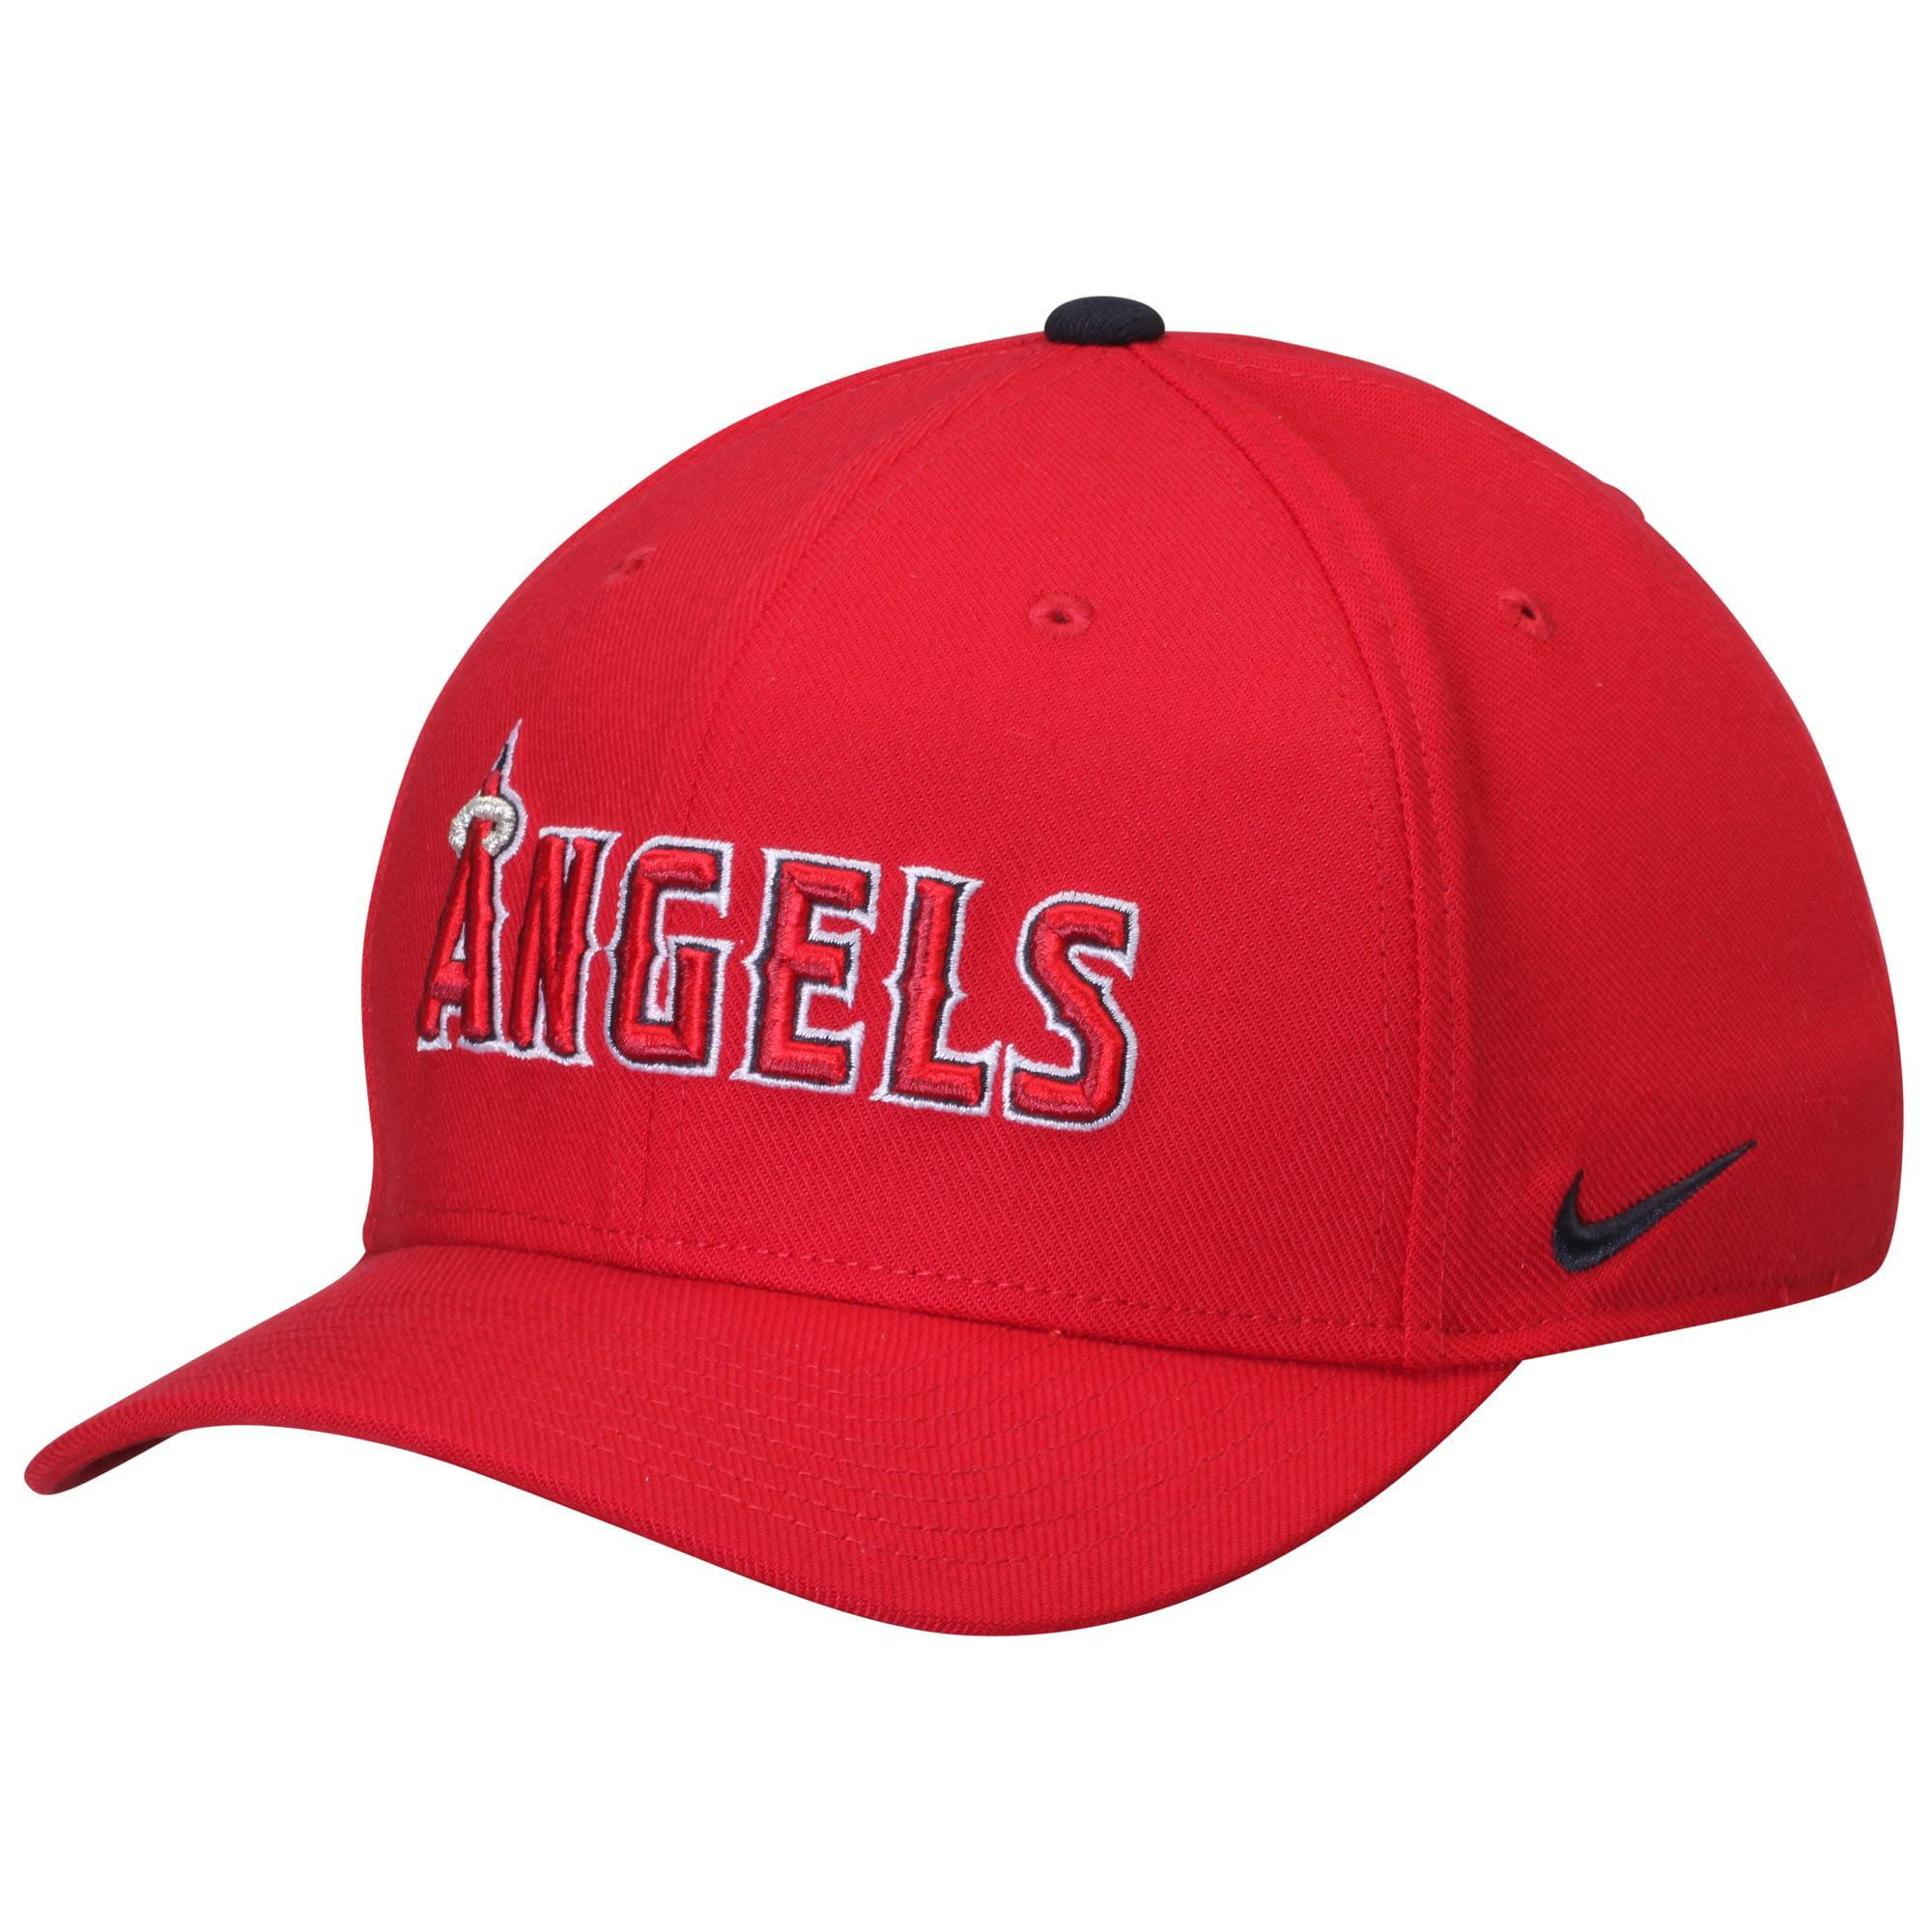 Men's Nike Red Los Angeles Angels Classic Swoosh Performance Flex Hat